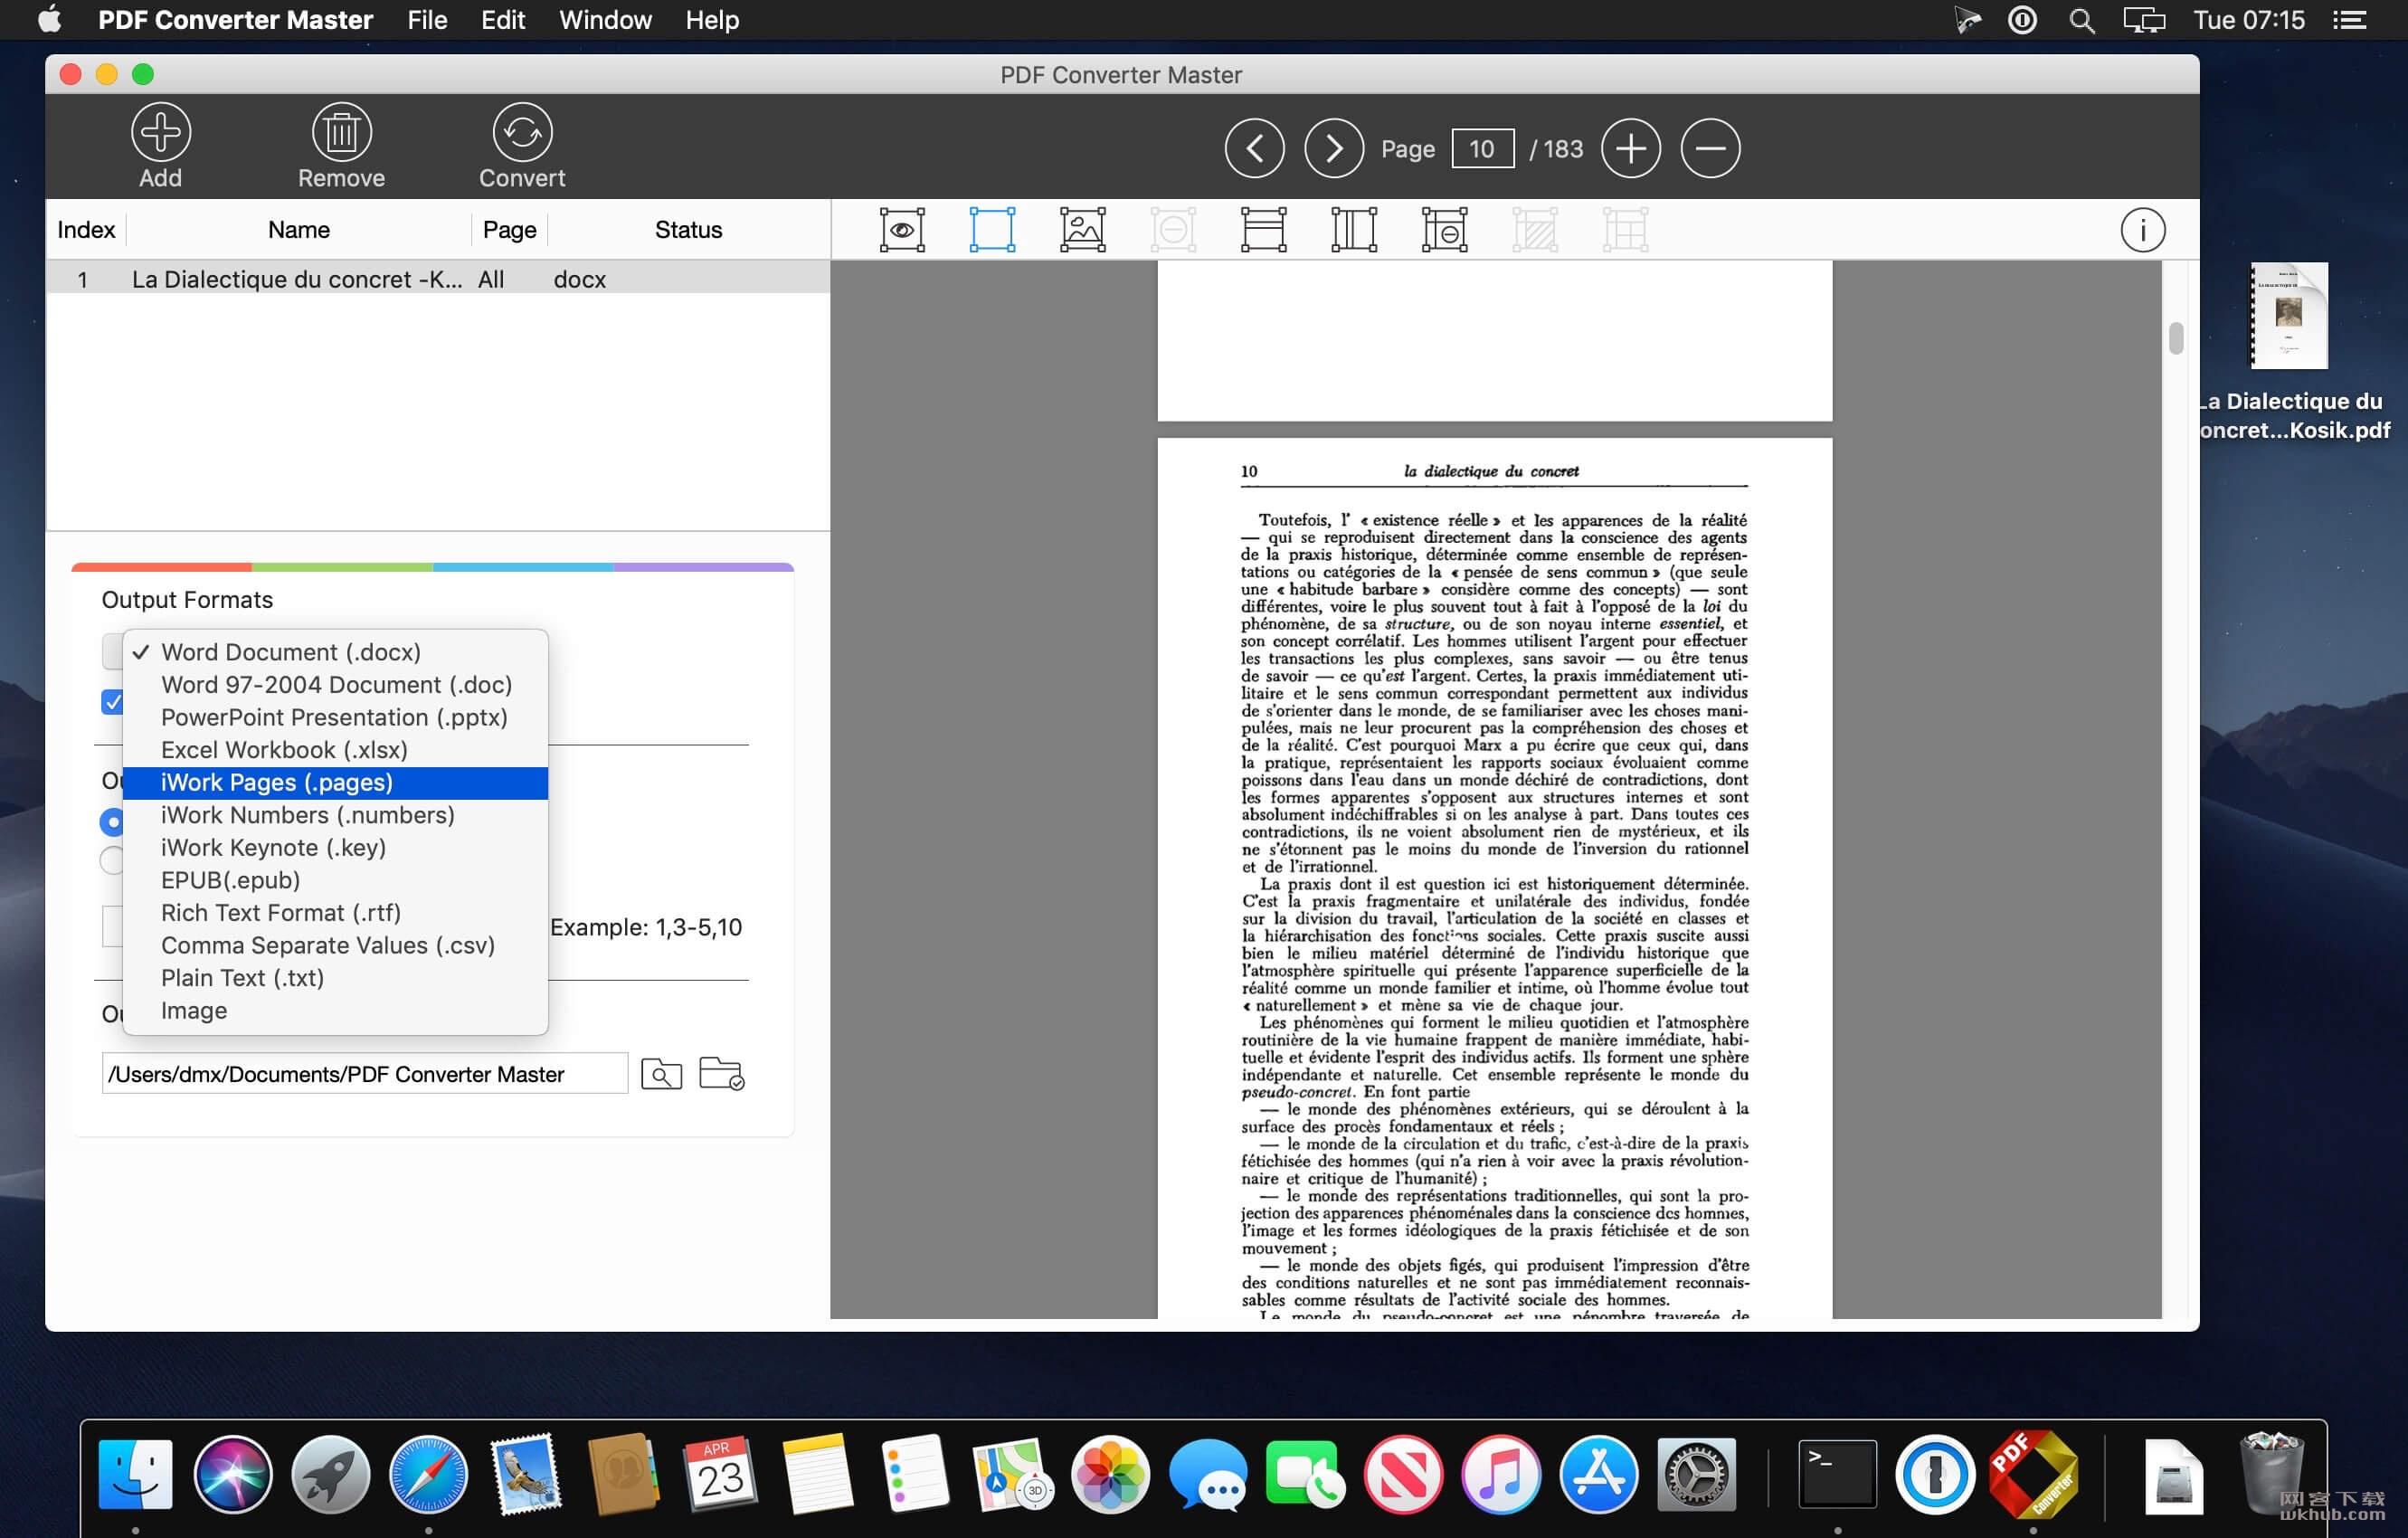 PDF Converter Master 6.2.1 PDF格式转换工具